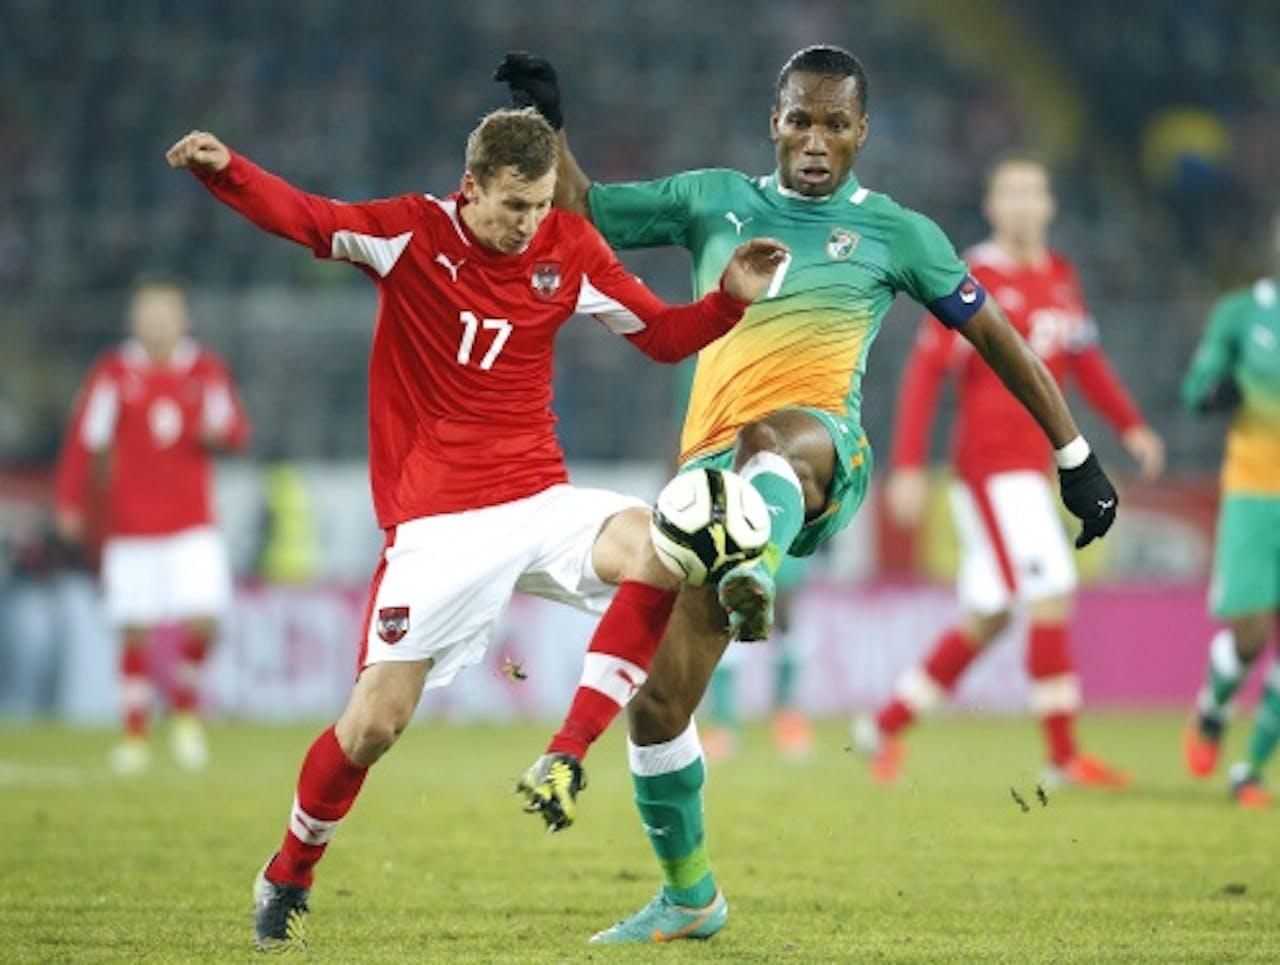 Florian Klein (L) van Oostenrijk in duel met Didier Drogba (R) van Ivoorkust. EPA